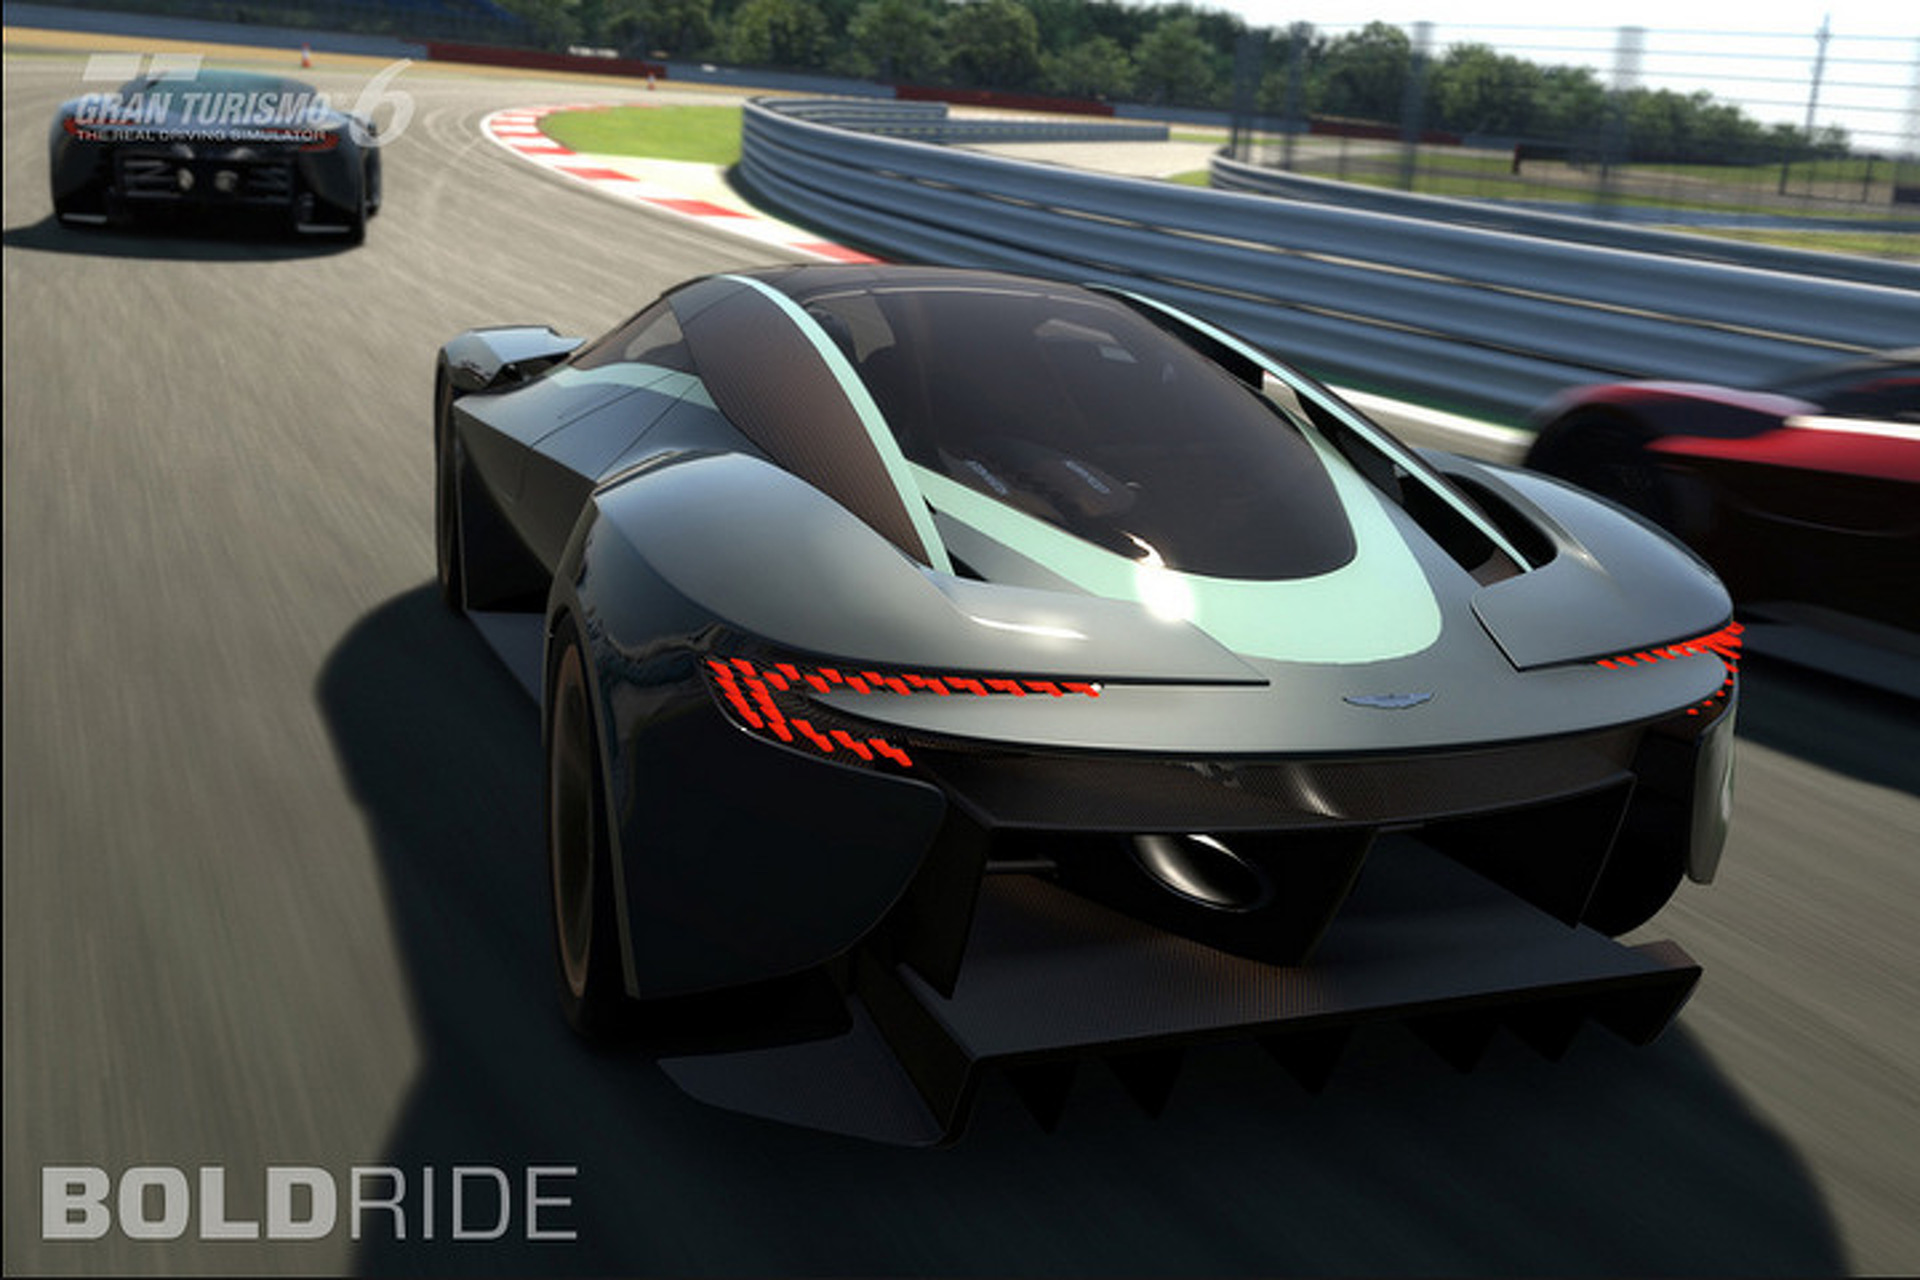 Aston Martin DP 100 Is A Fantastic, Digital Vision Of A Future Supercar  [w/Video]